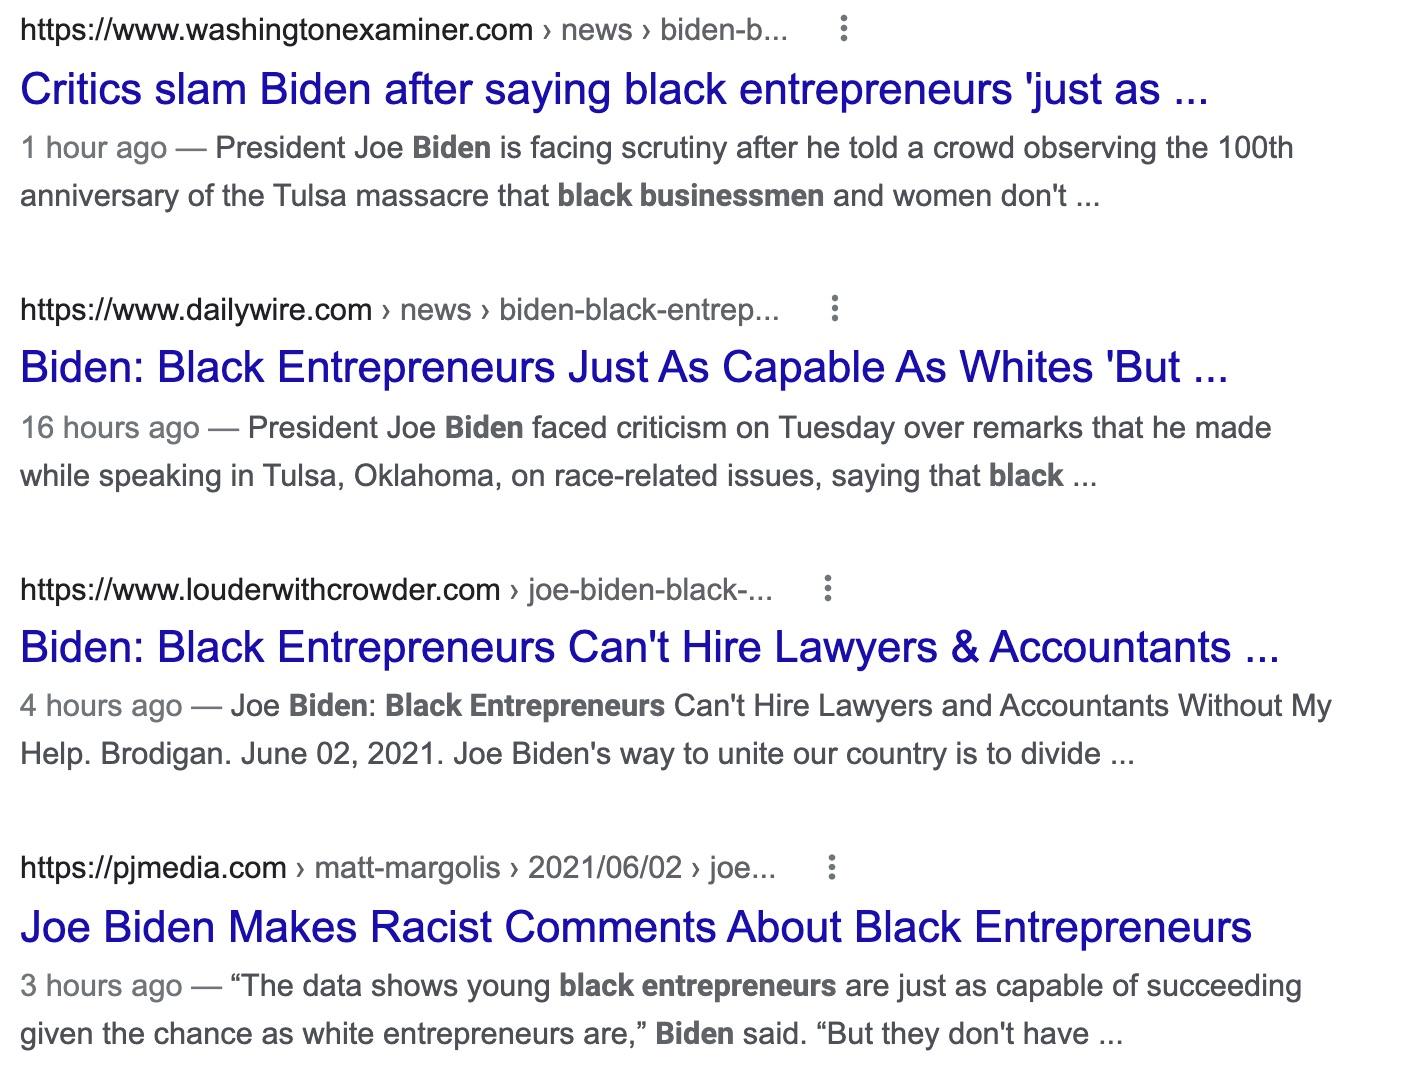 biden black entrepreneurs accountants